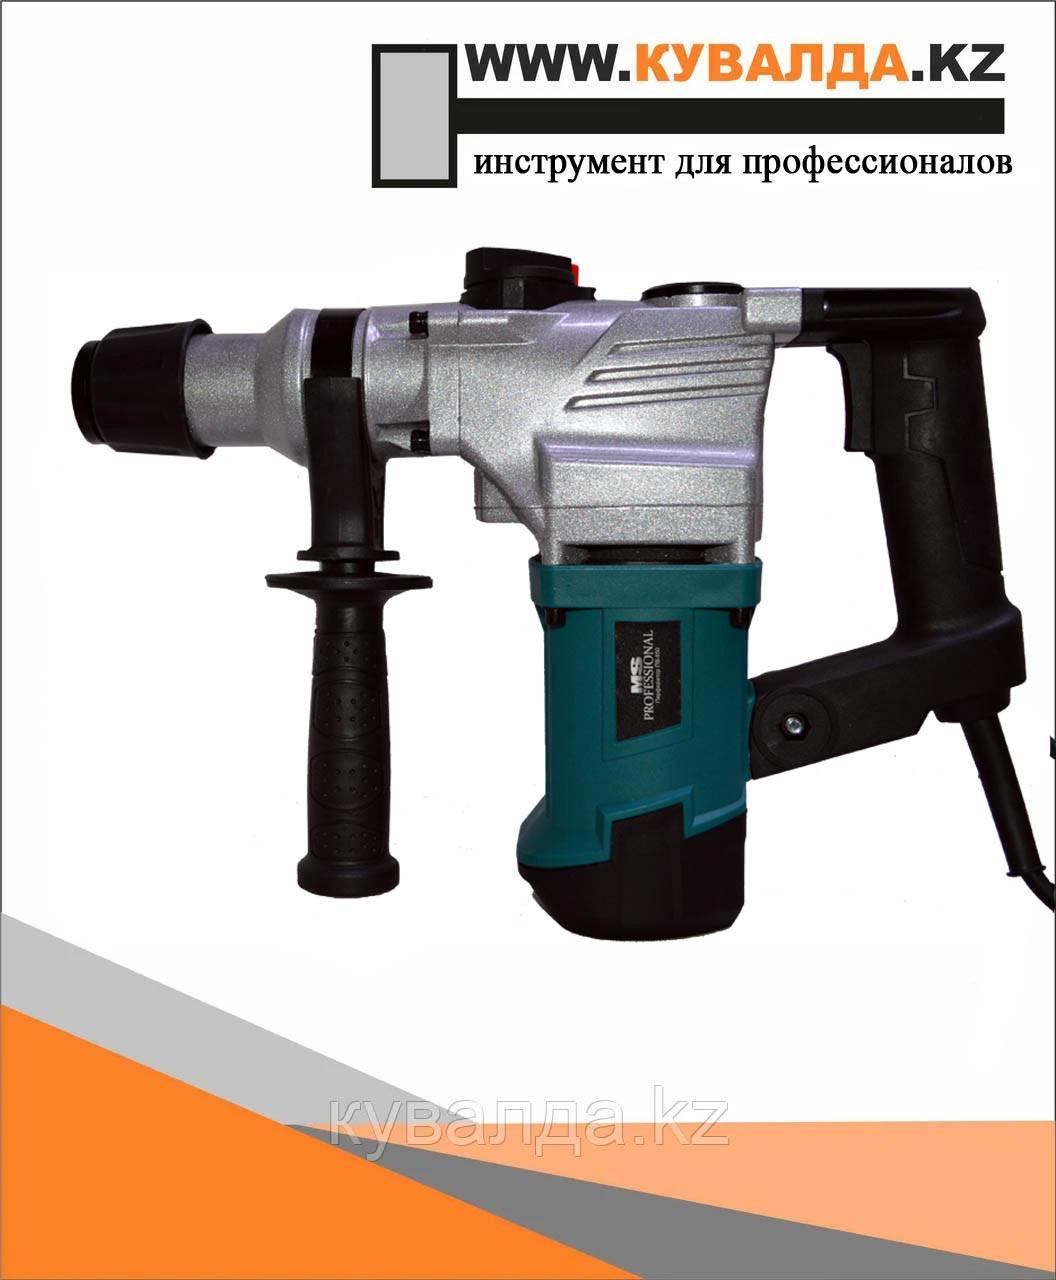 Перфоратор ПВ-850 MS Professional